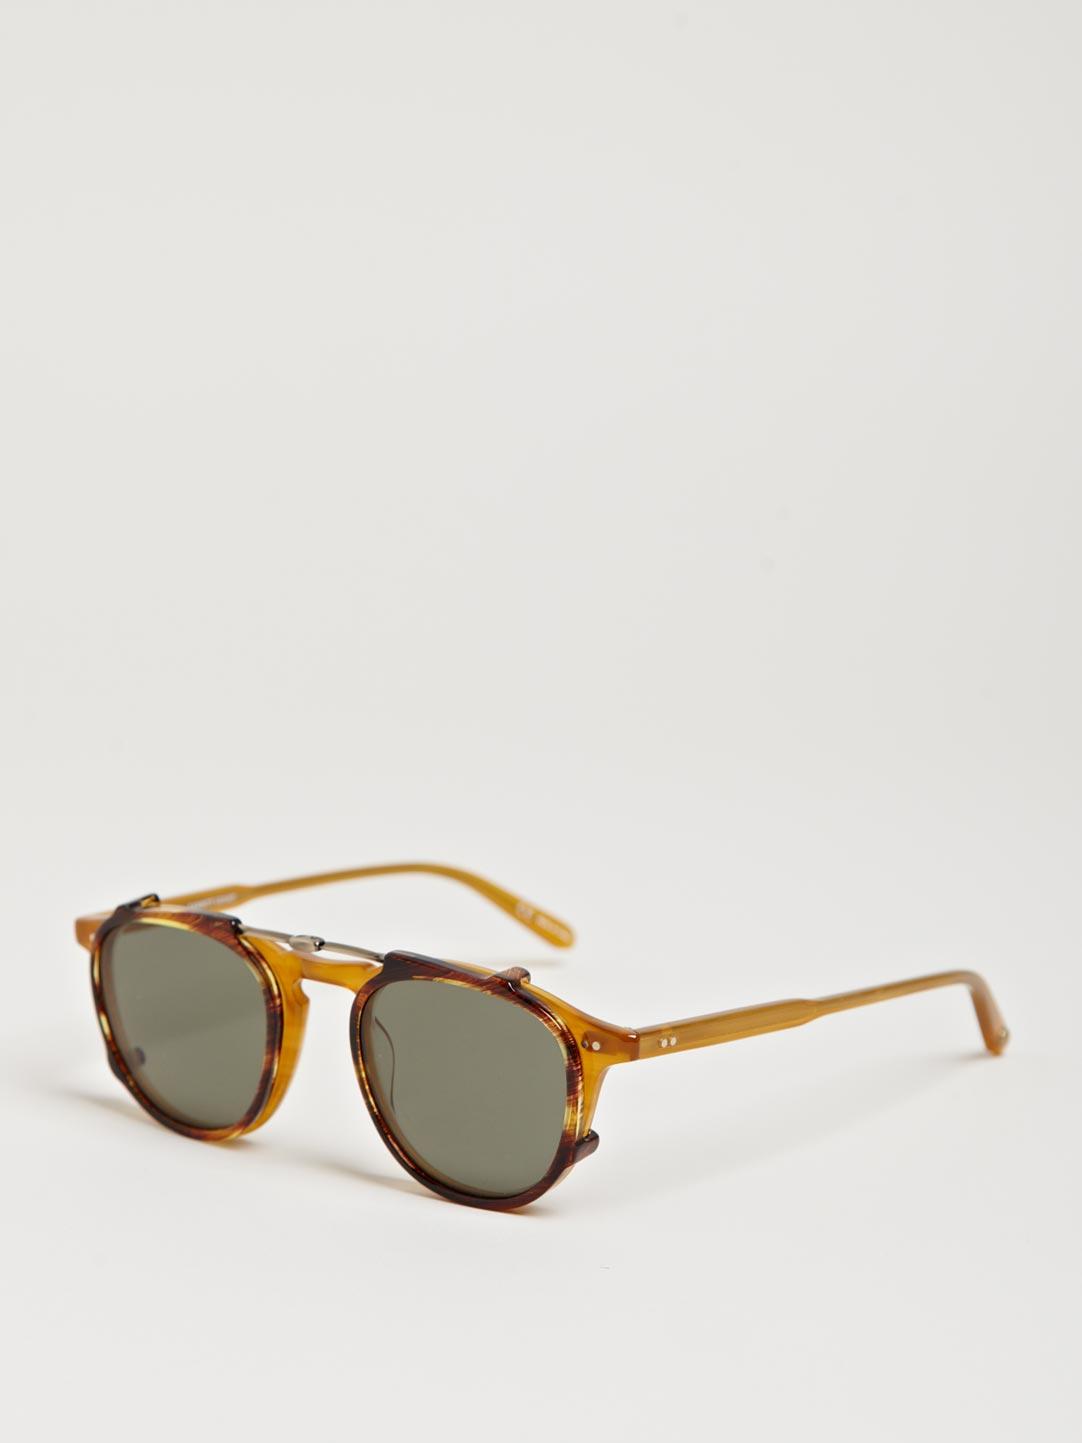 Polar 1 Sunglasses  garrett leight hampton erscotch brown polar sunglasses in